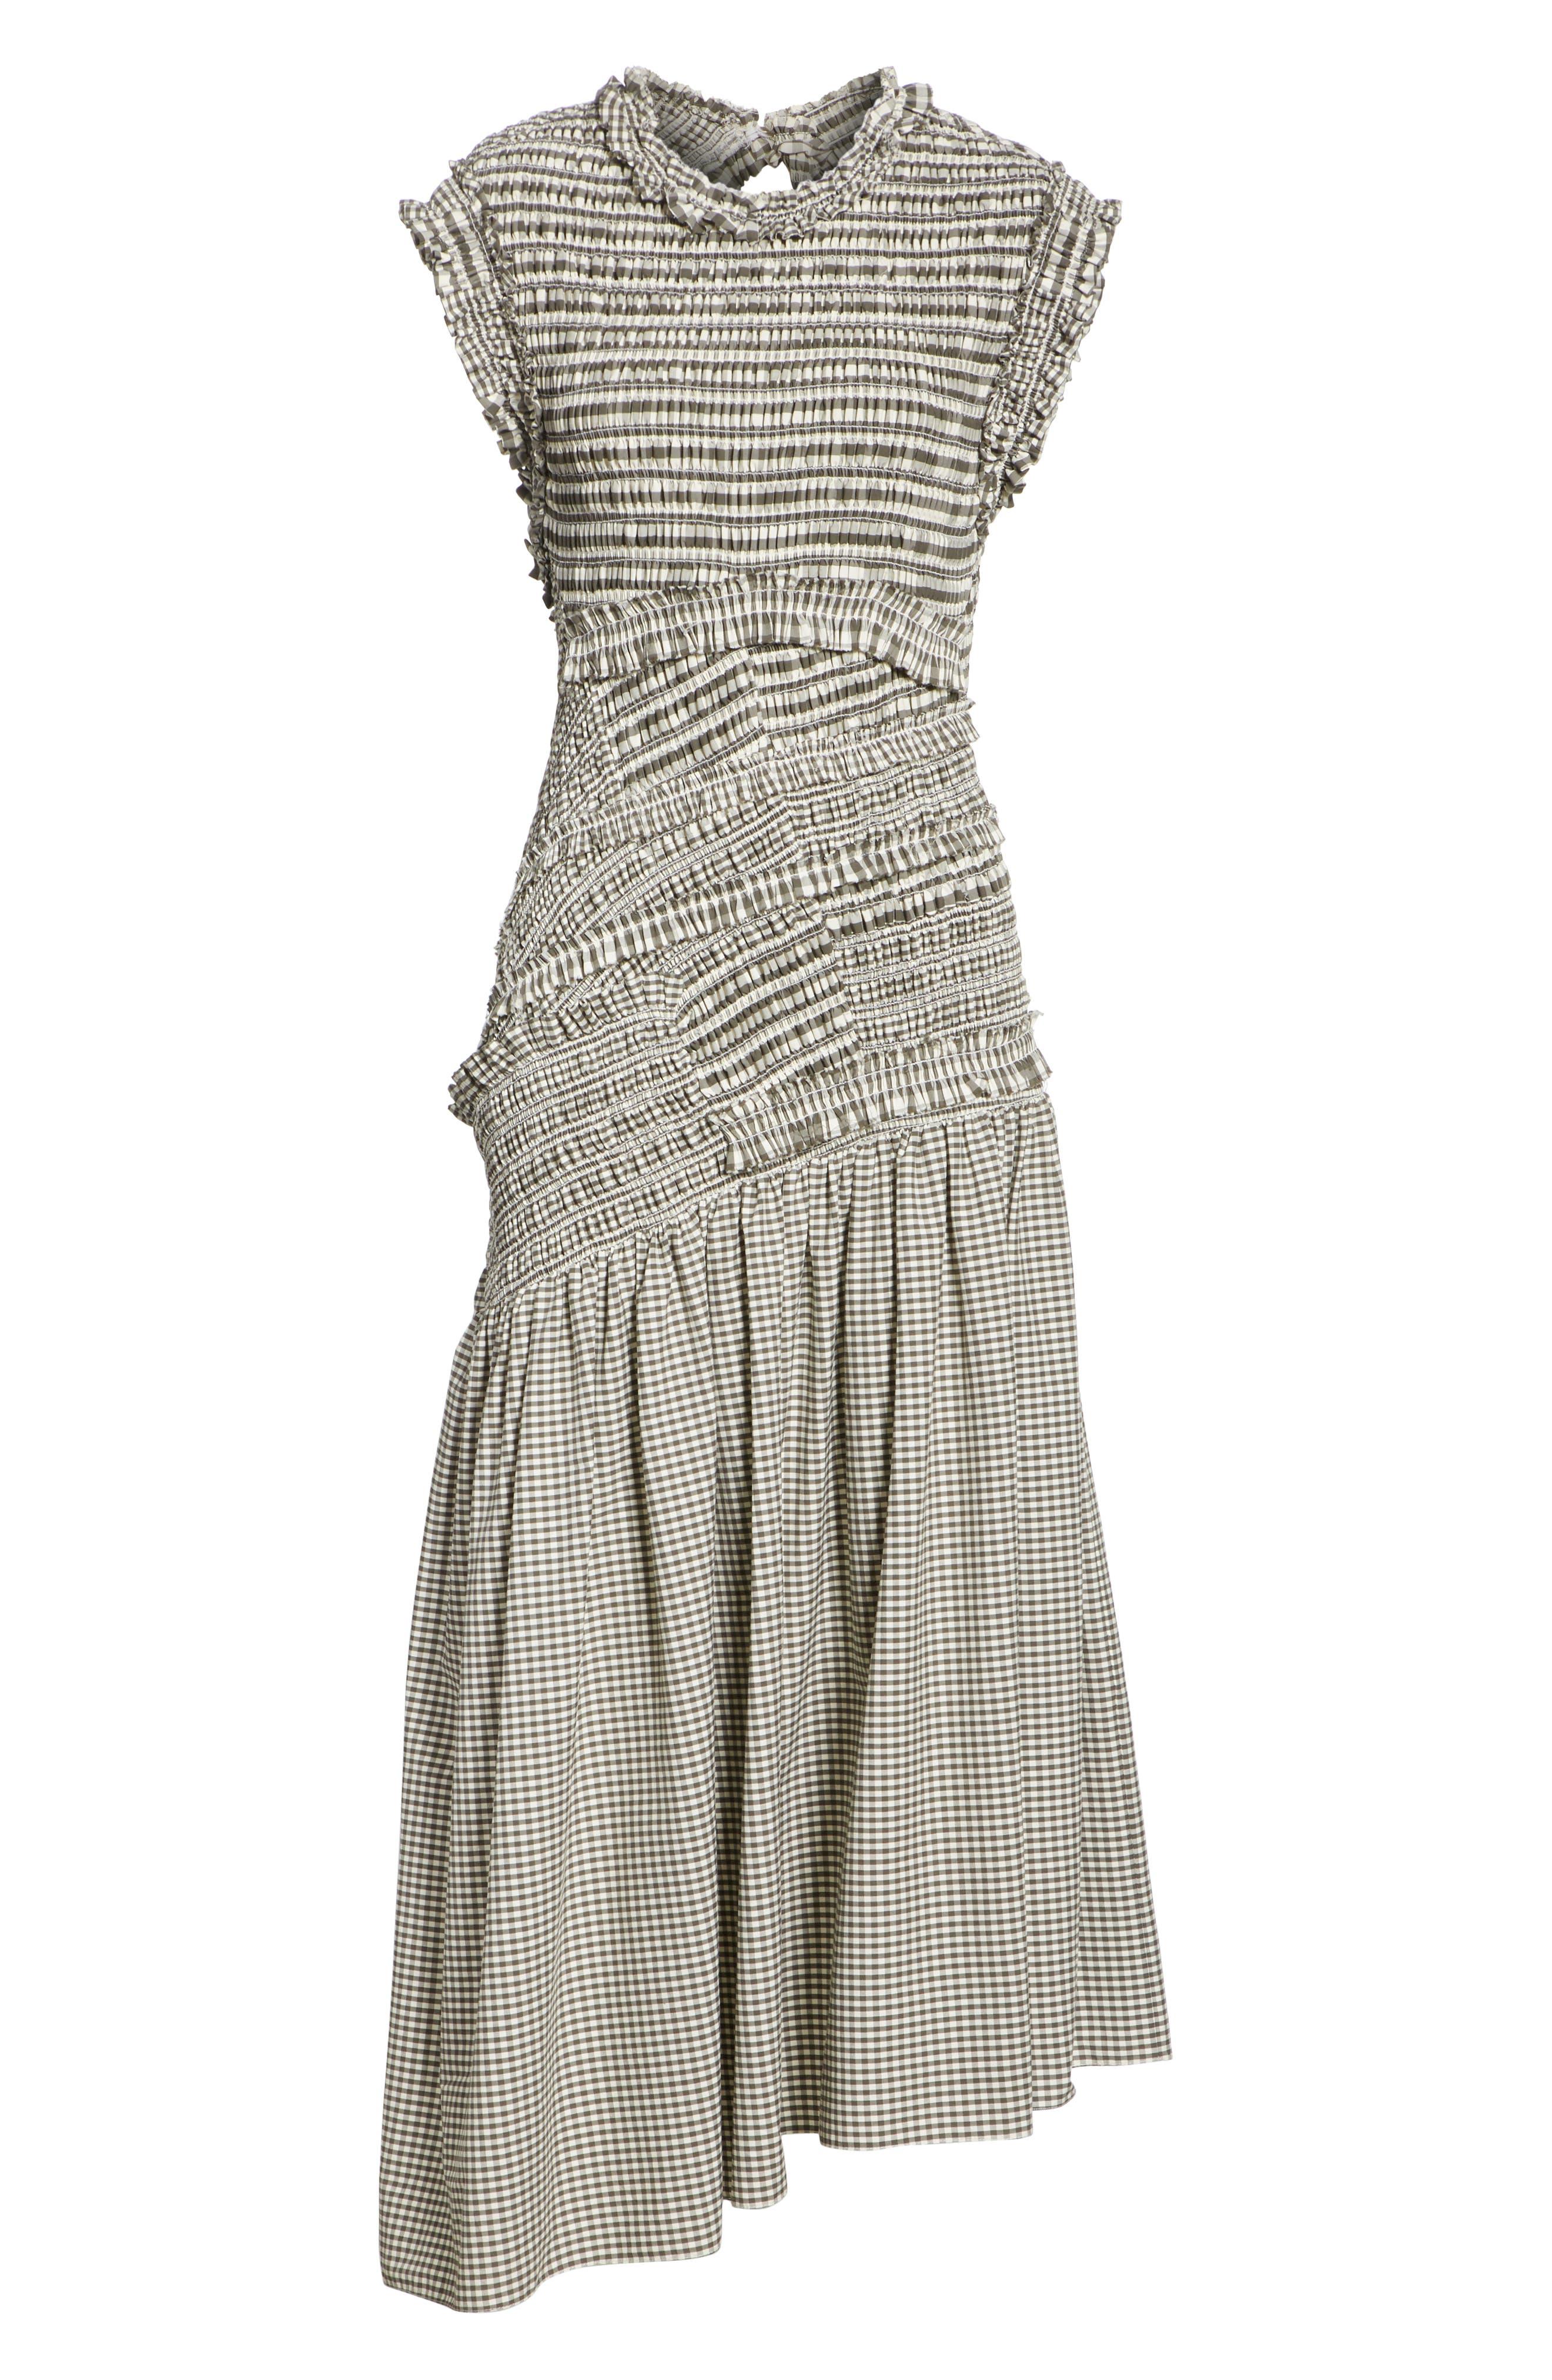 Gathered Gingham Drop Waist Dress,                             Alternate thumbnail 6, color,                             033